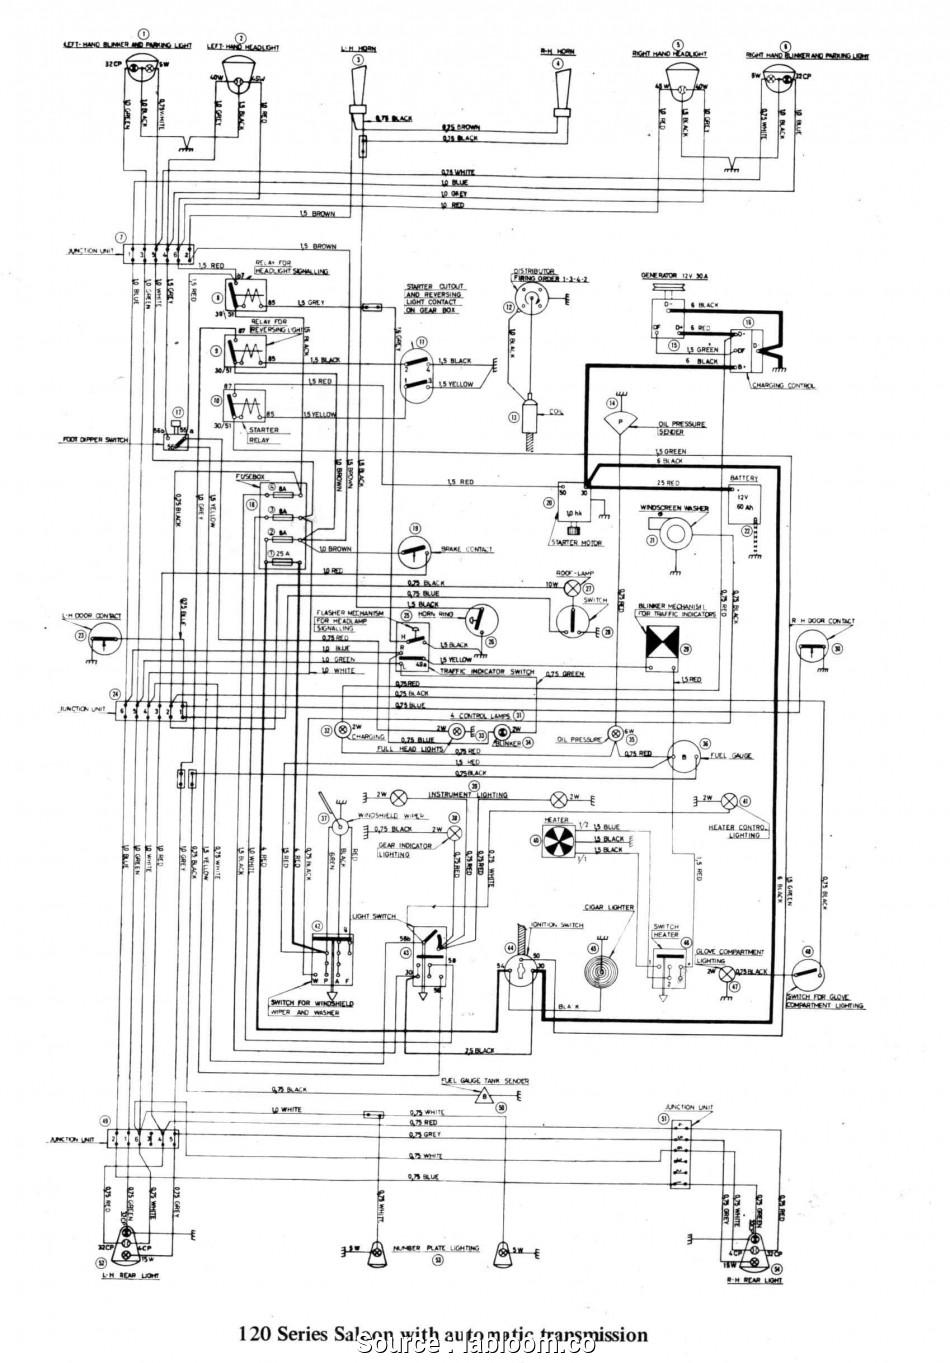 [SCHEMATICS_4CA]  RN_0764] 359 Peterbilt Wiring Diagram Download Diagram | 1983 Peterbilt Wiring Diagram |  | Coun Penghe Ilari Gresi Chro Carn Ospor Garna Grebs Unho Rele  Mohammedshrine Librar Wiring 101